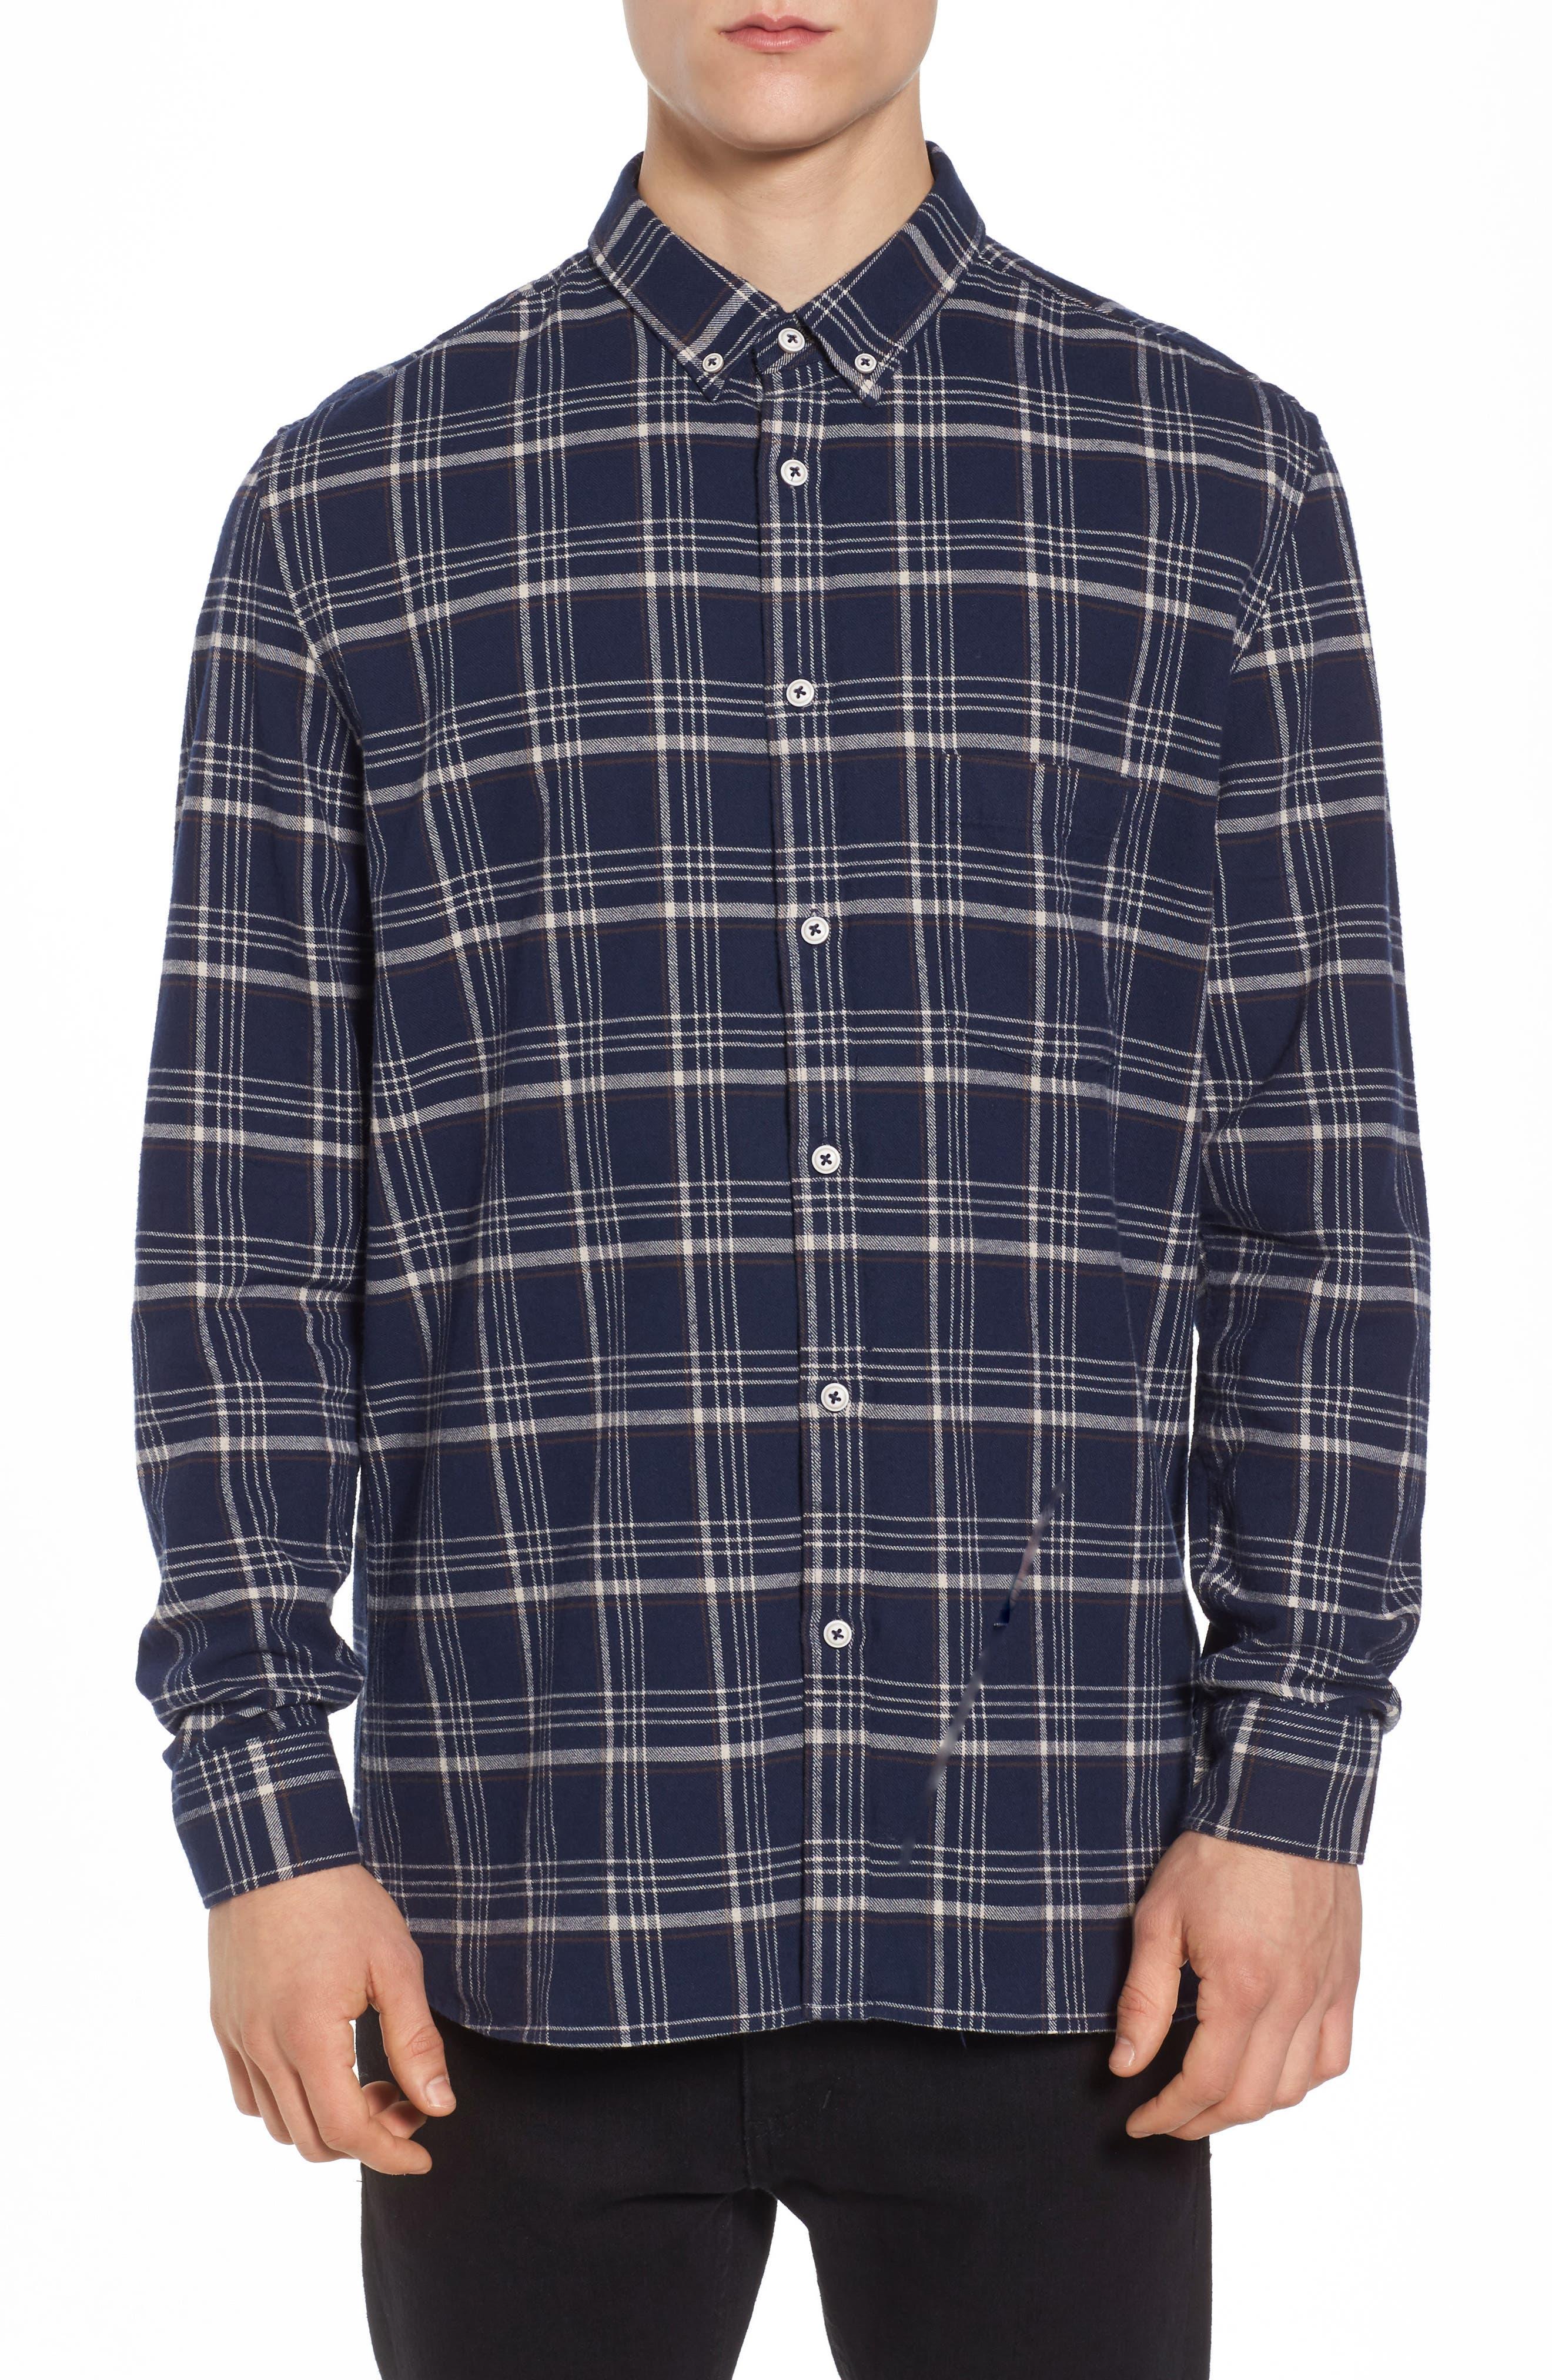 Main Image - Barney Cools Cabin Plaid Shirt